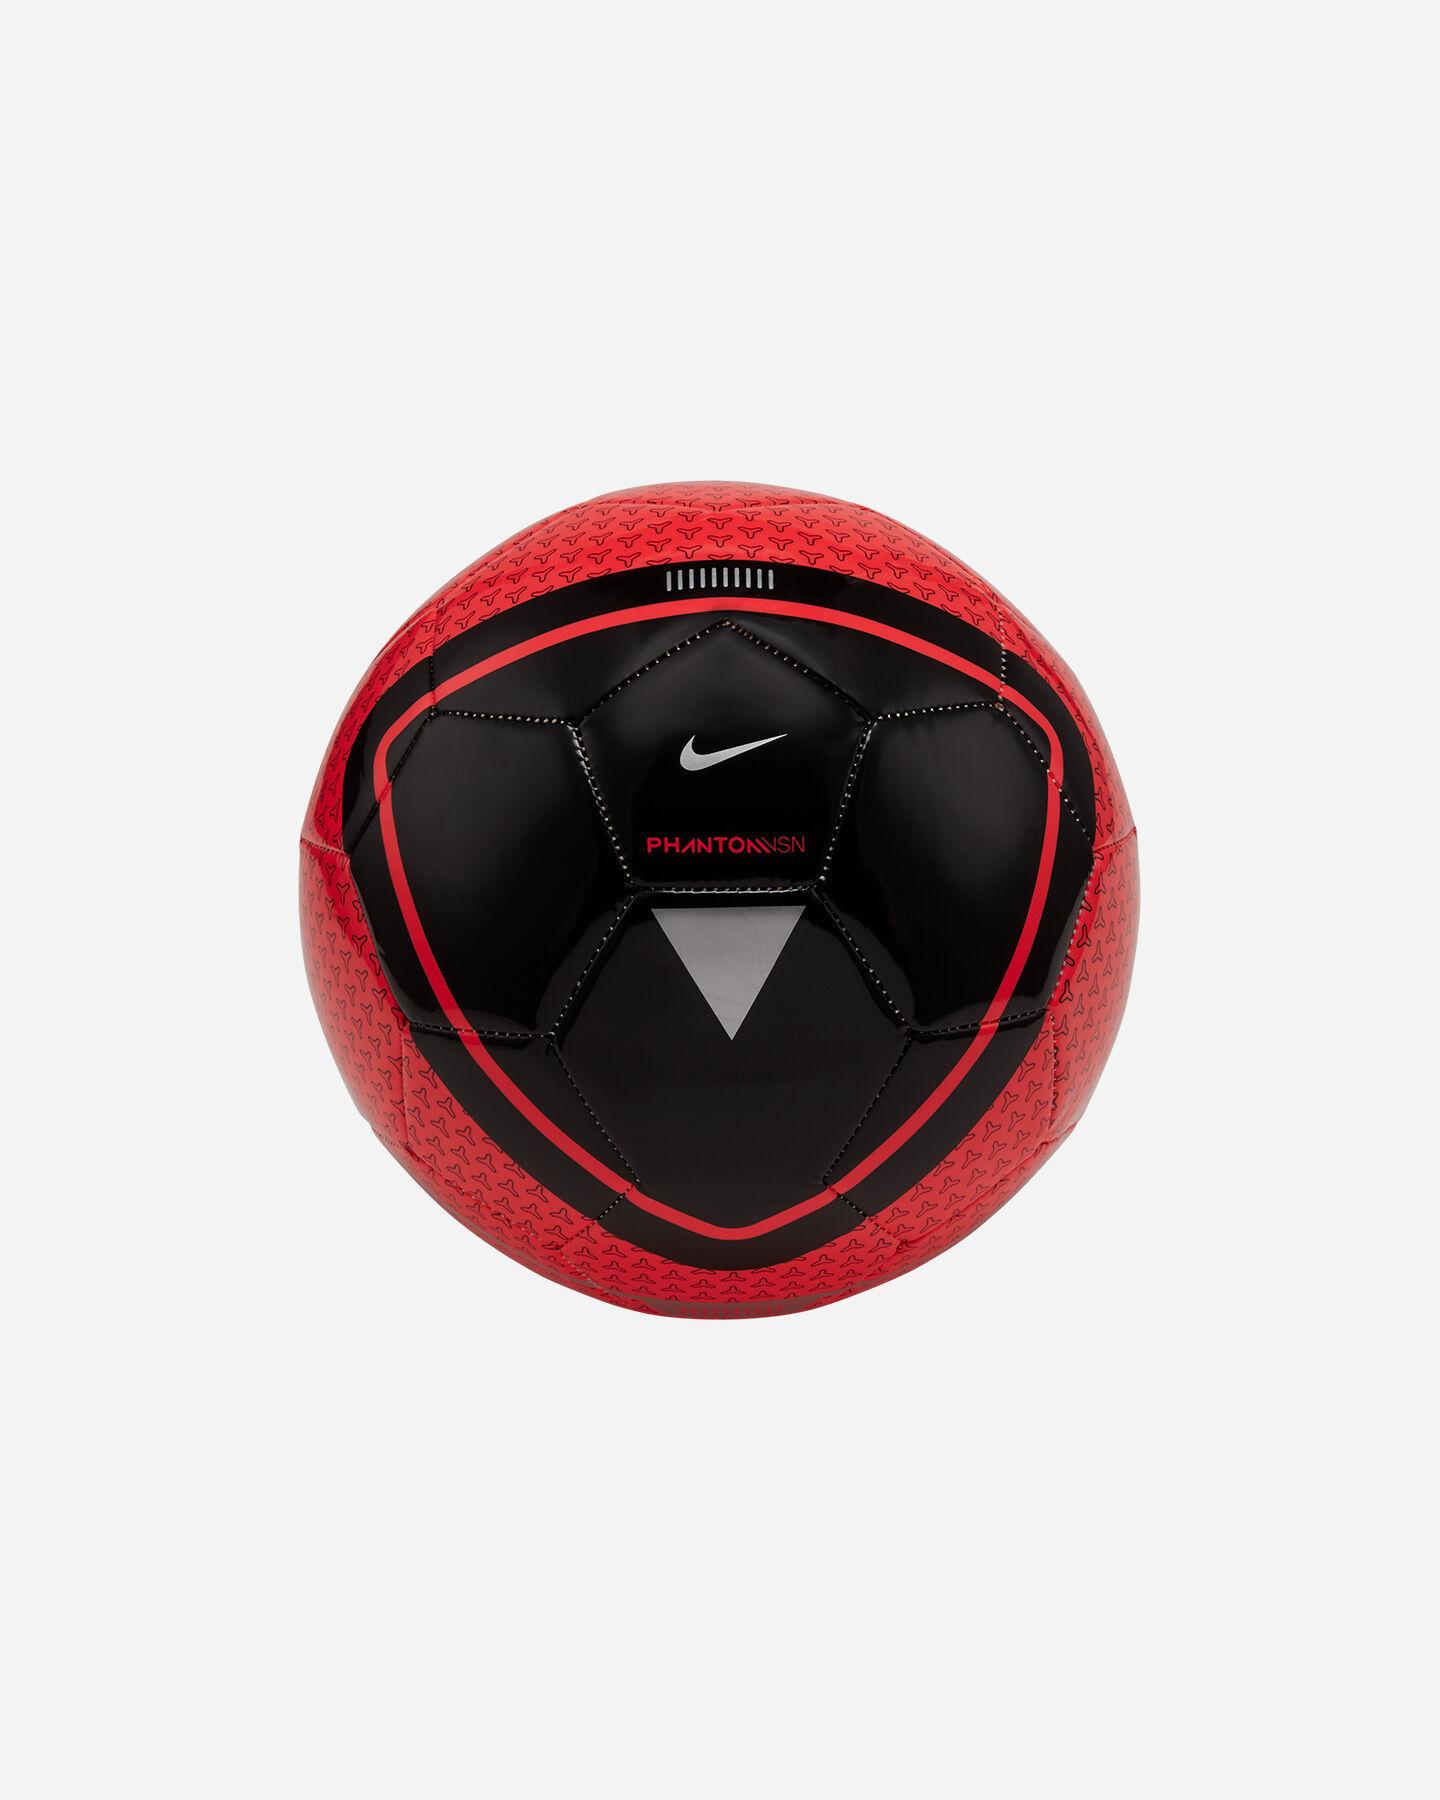 Pallone calcio NIKE PHANTOM VISION S5165466|644|5 scatto 0